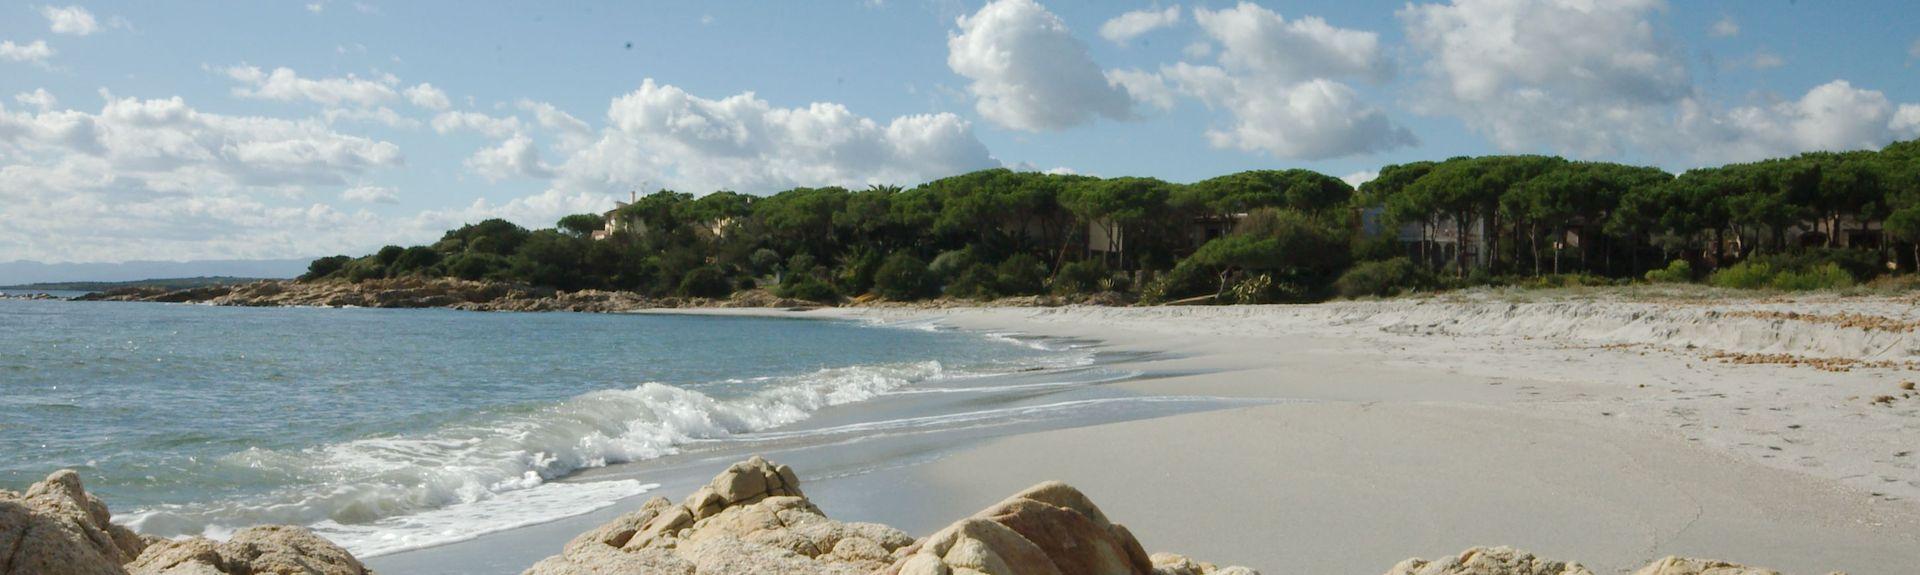 Strand von Cala Ginepro, Cala Liberotto, Sardinien, Italien